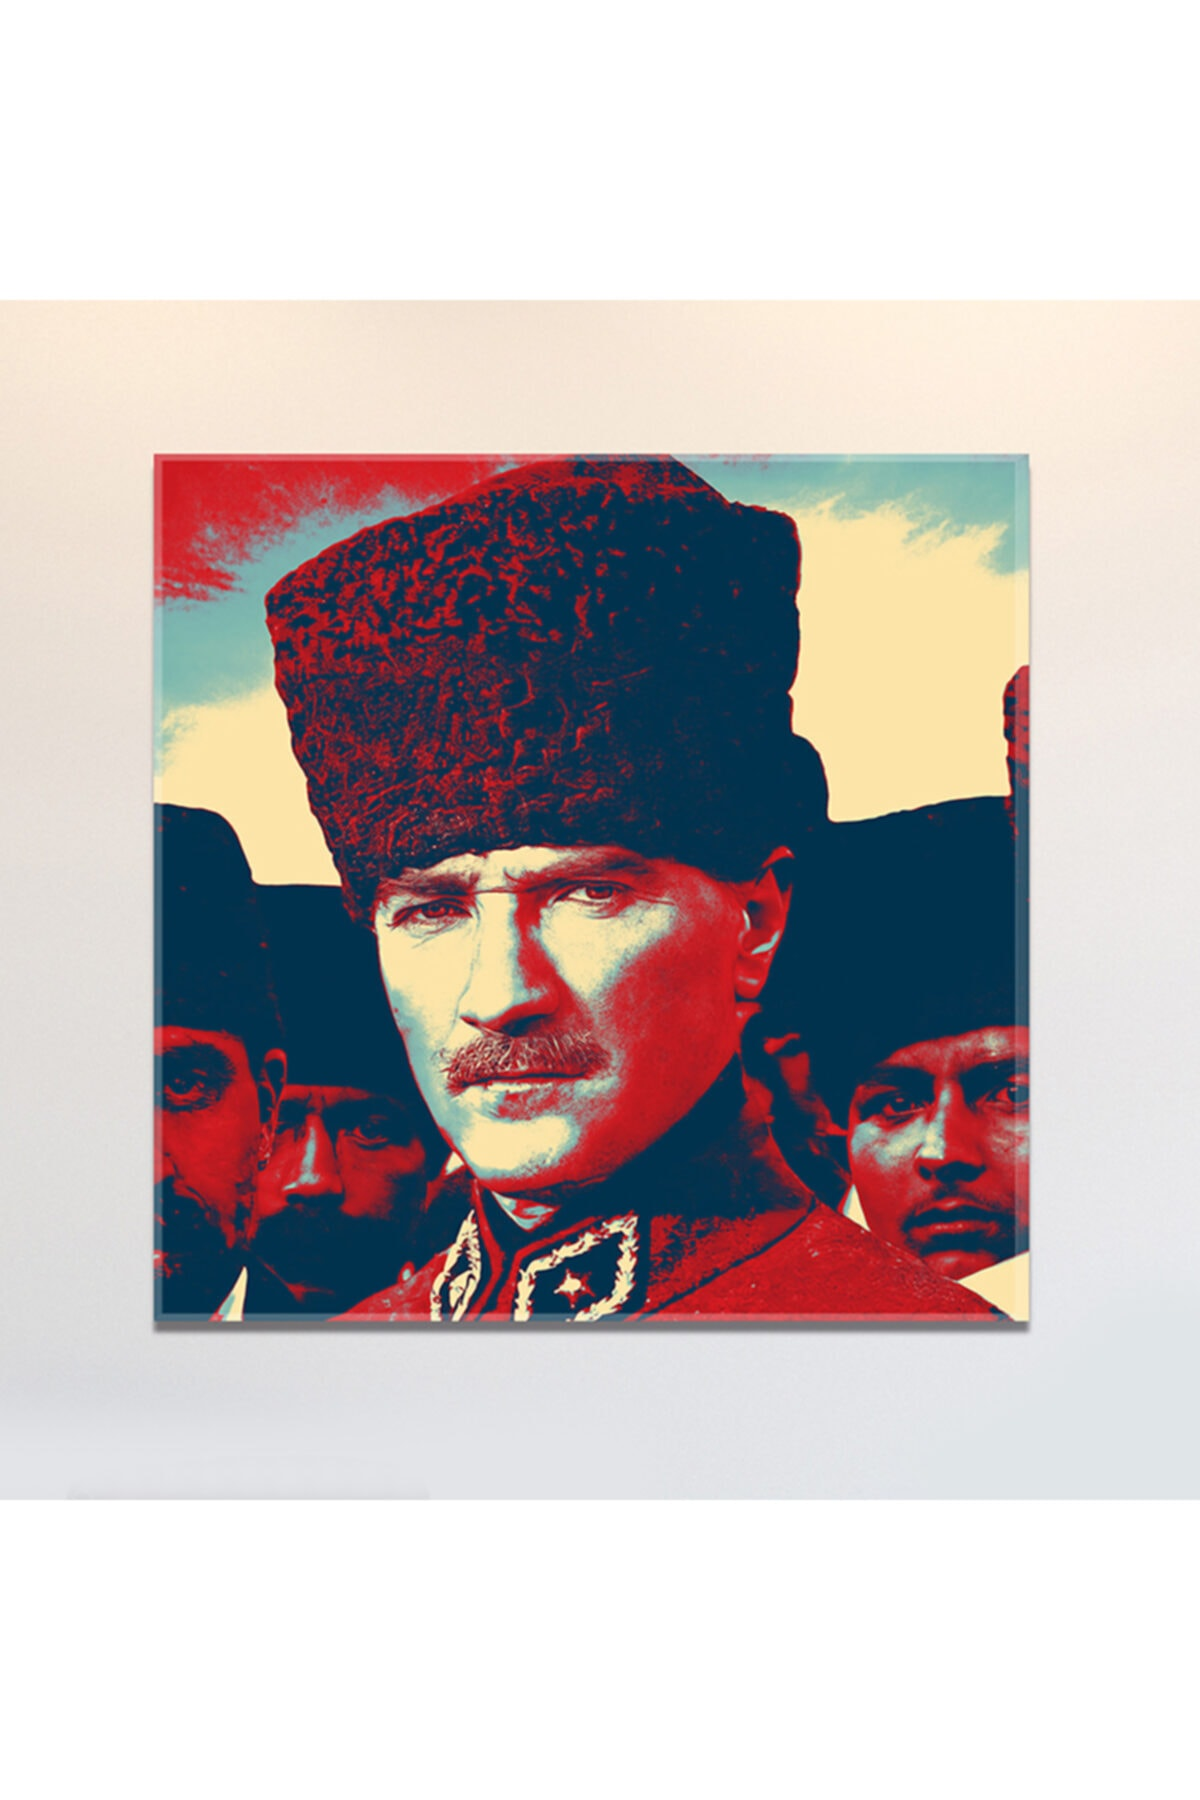 PabloFi Gazi Mustafa Kemal Atatürk Kalpaklı Efektli Kanvas Tablo 1